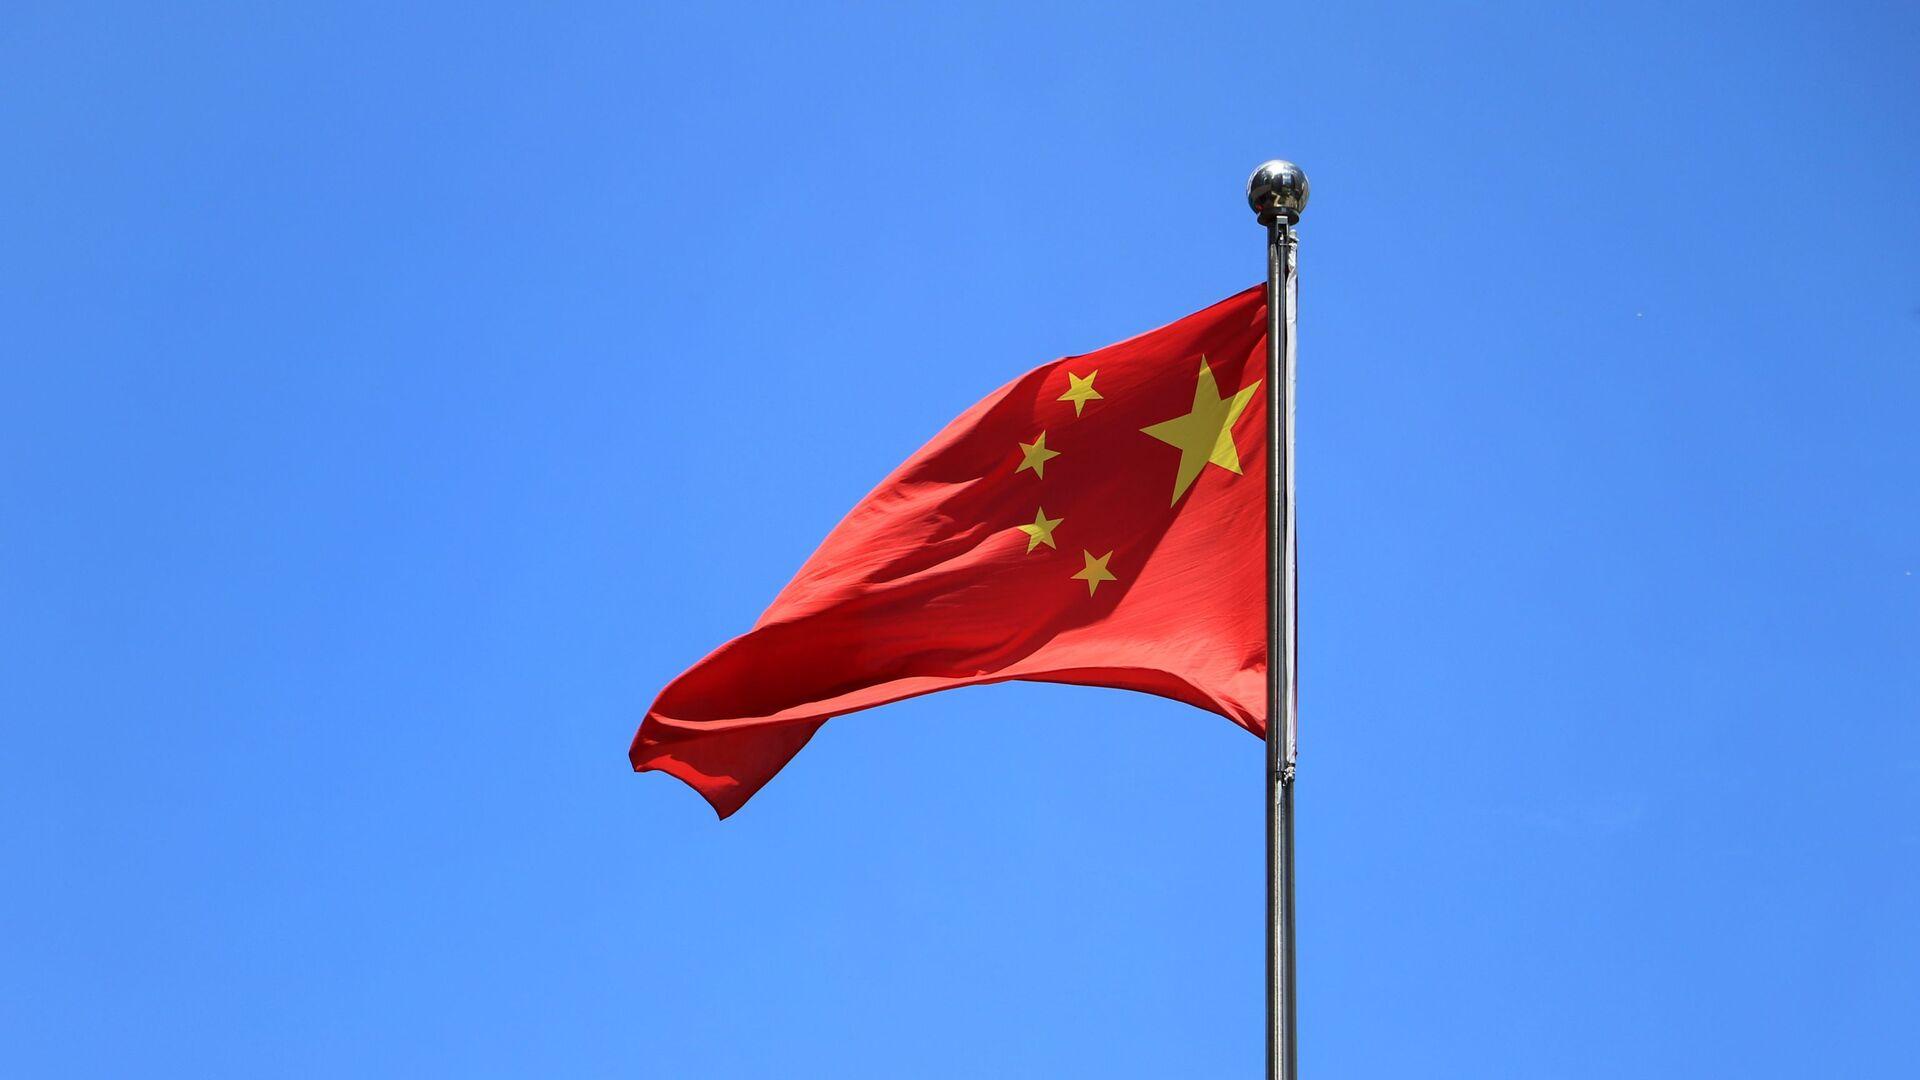 La bandera de China - Sputnik Mundo, 1920, 23.03.2021